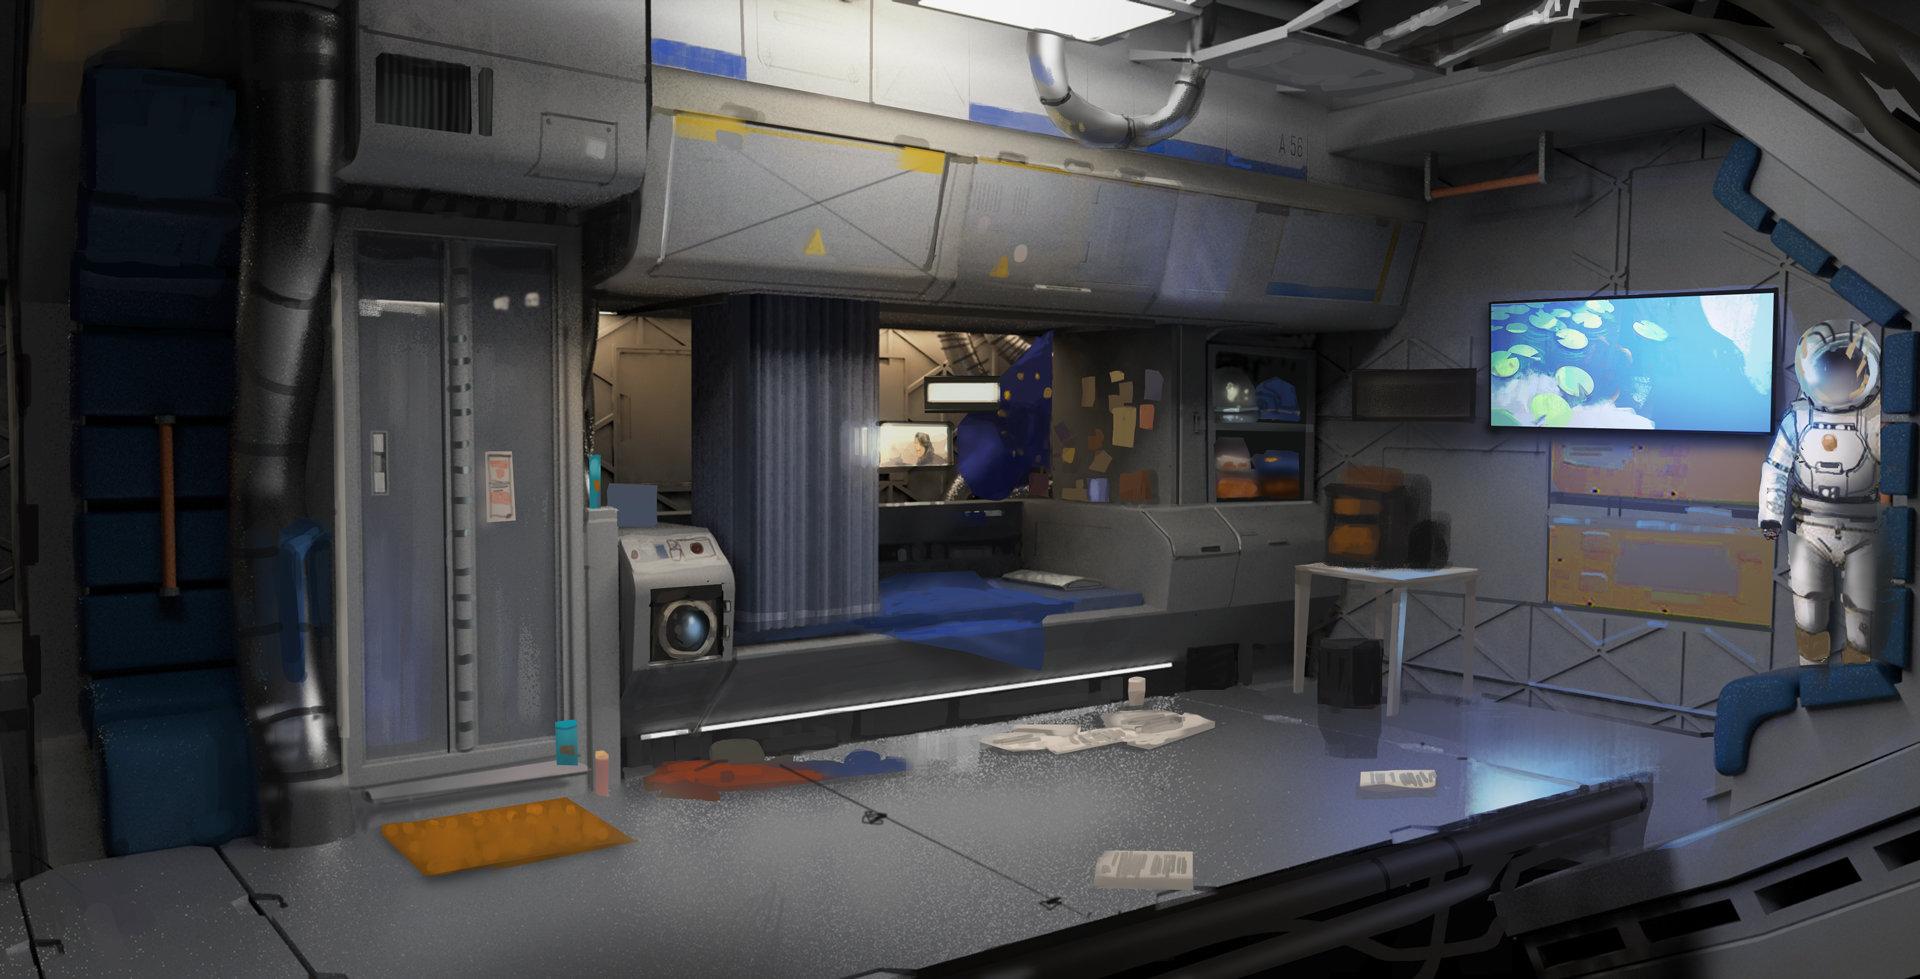 Mars Station - Cabin